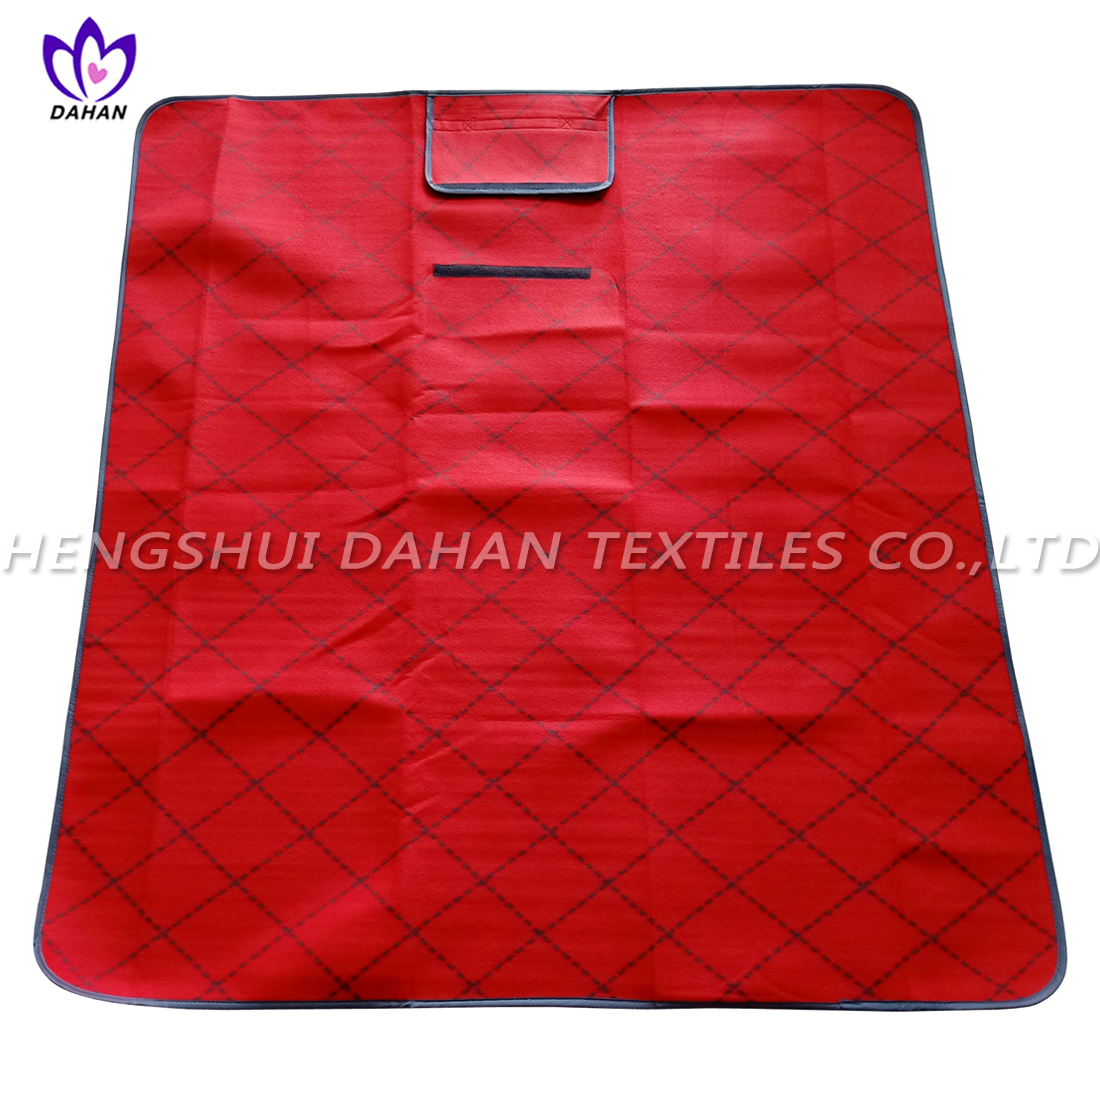 Picnic blanket waterproof picnic mat with printing.PM11